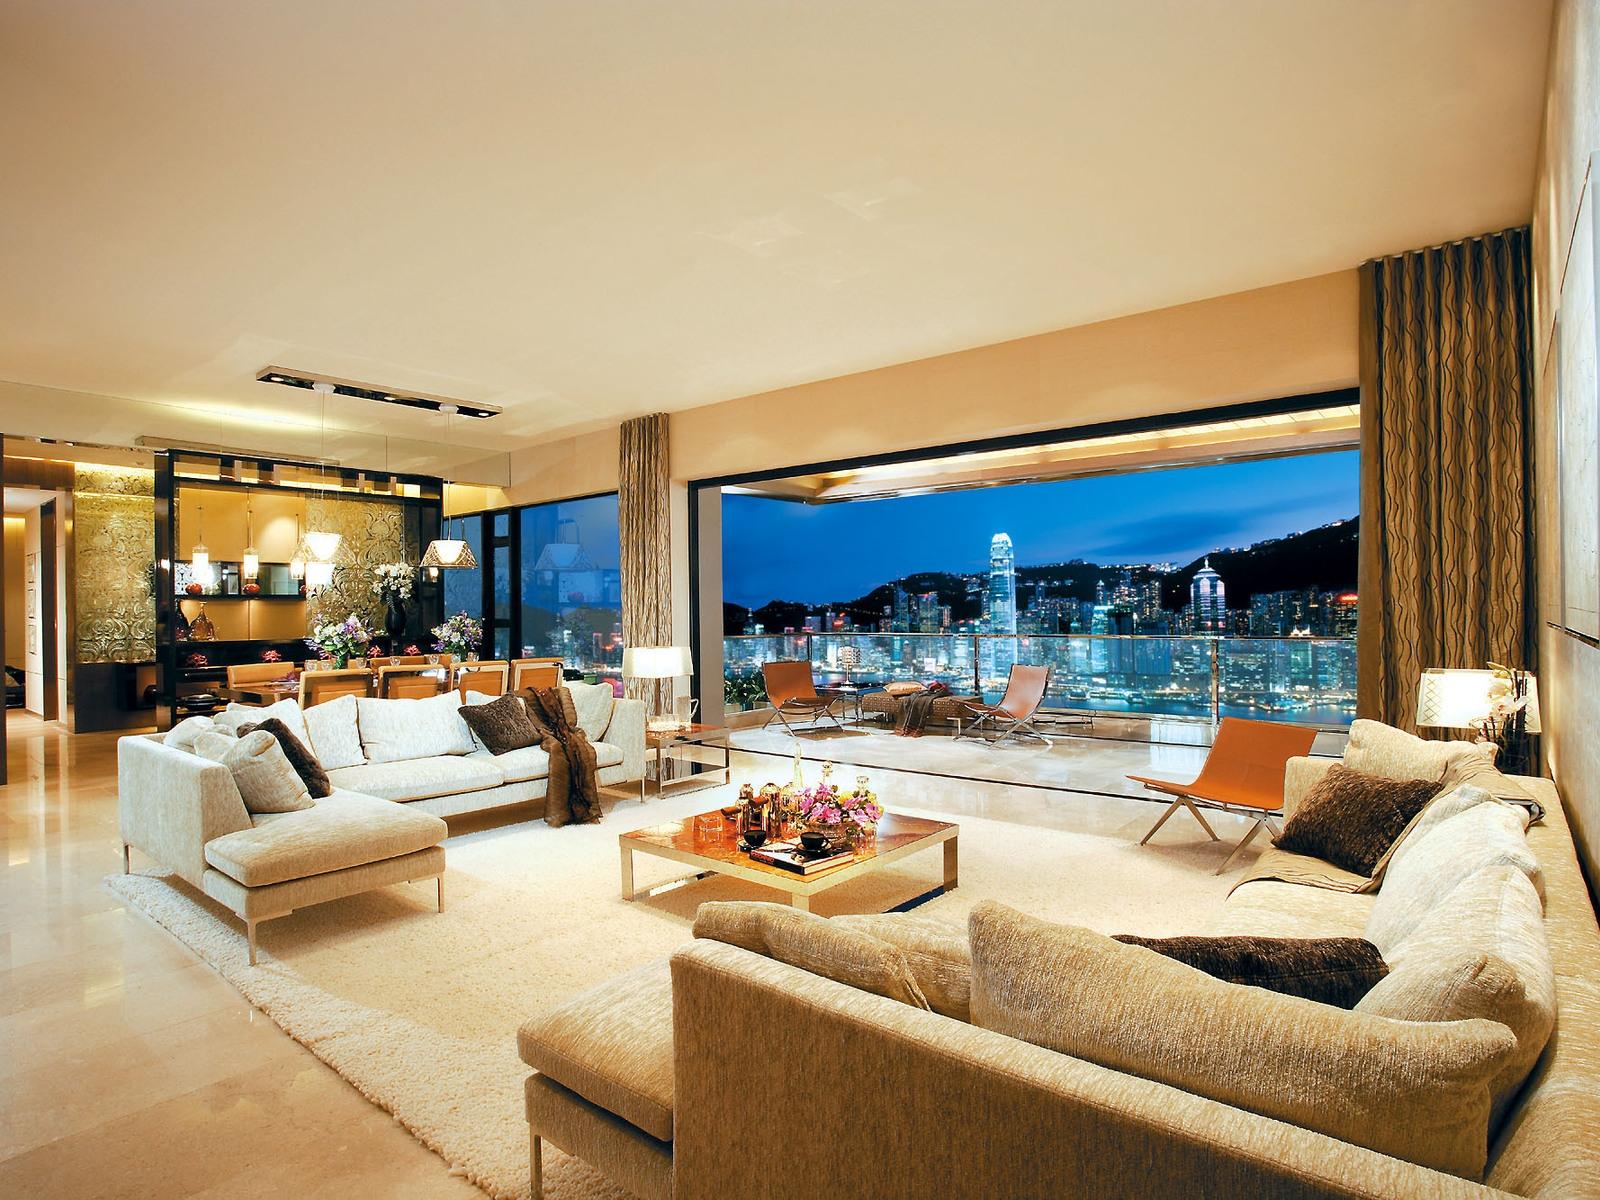 30 Modern Luxury Living Room Design Ideas Jul 14 2017 447shares